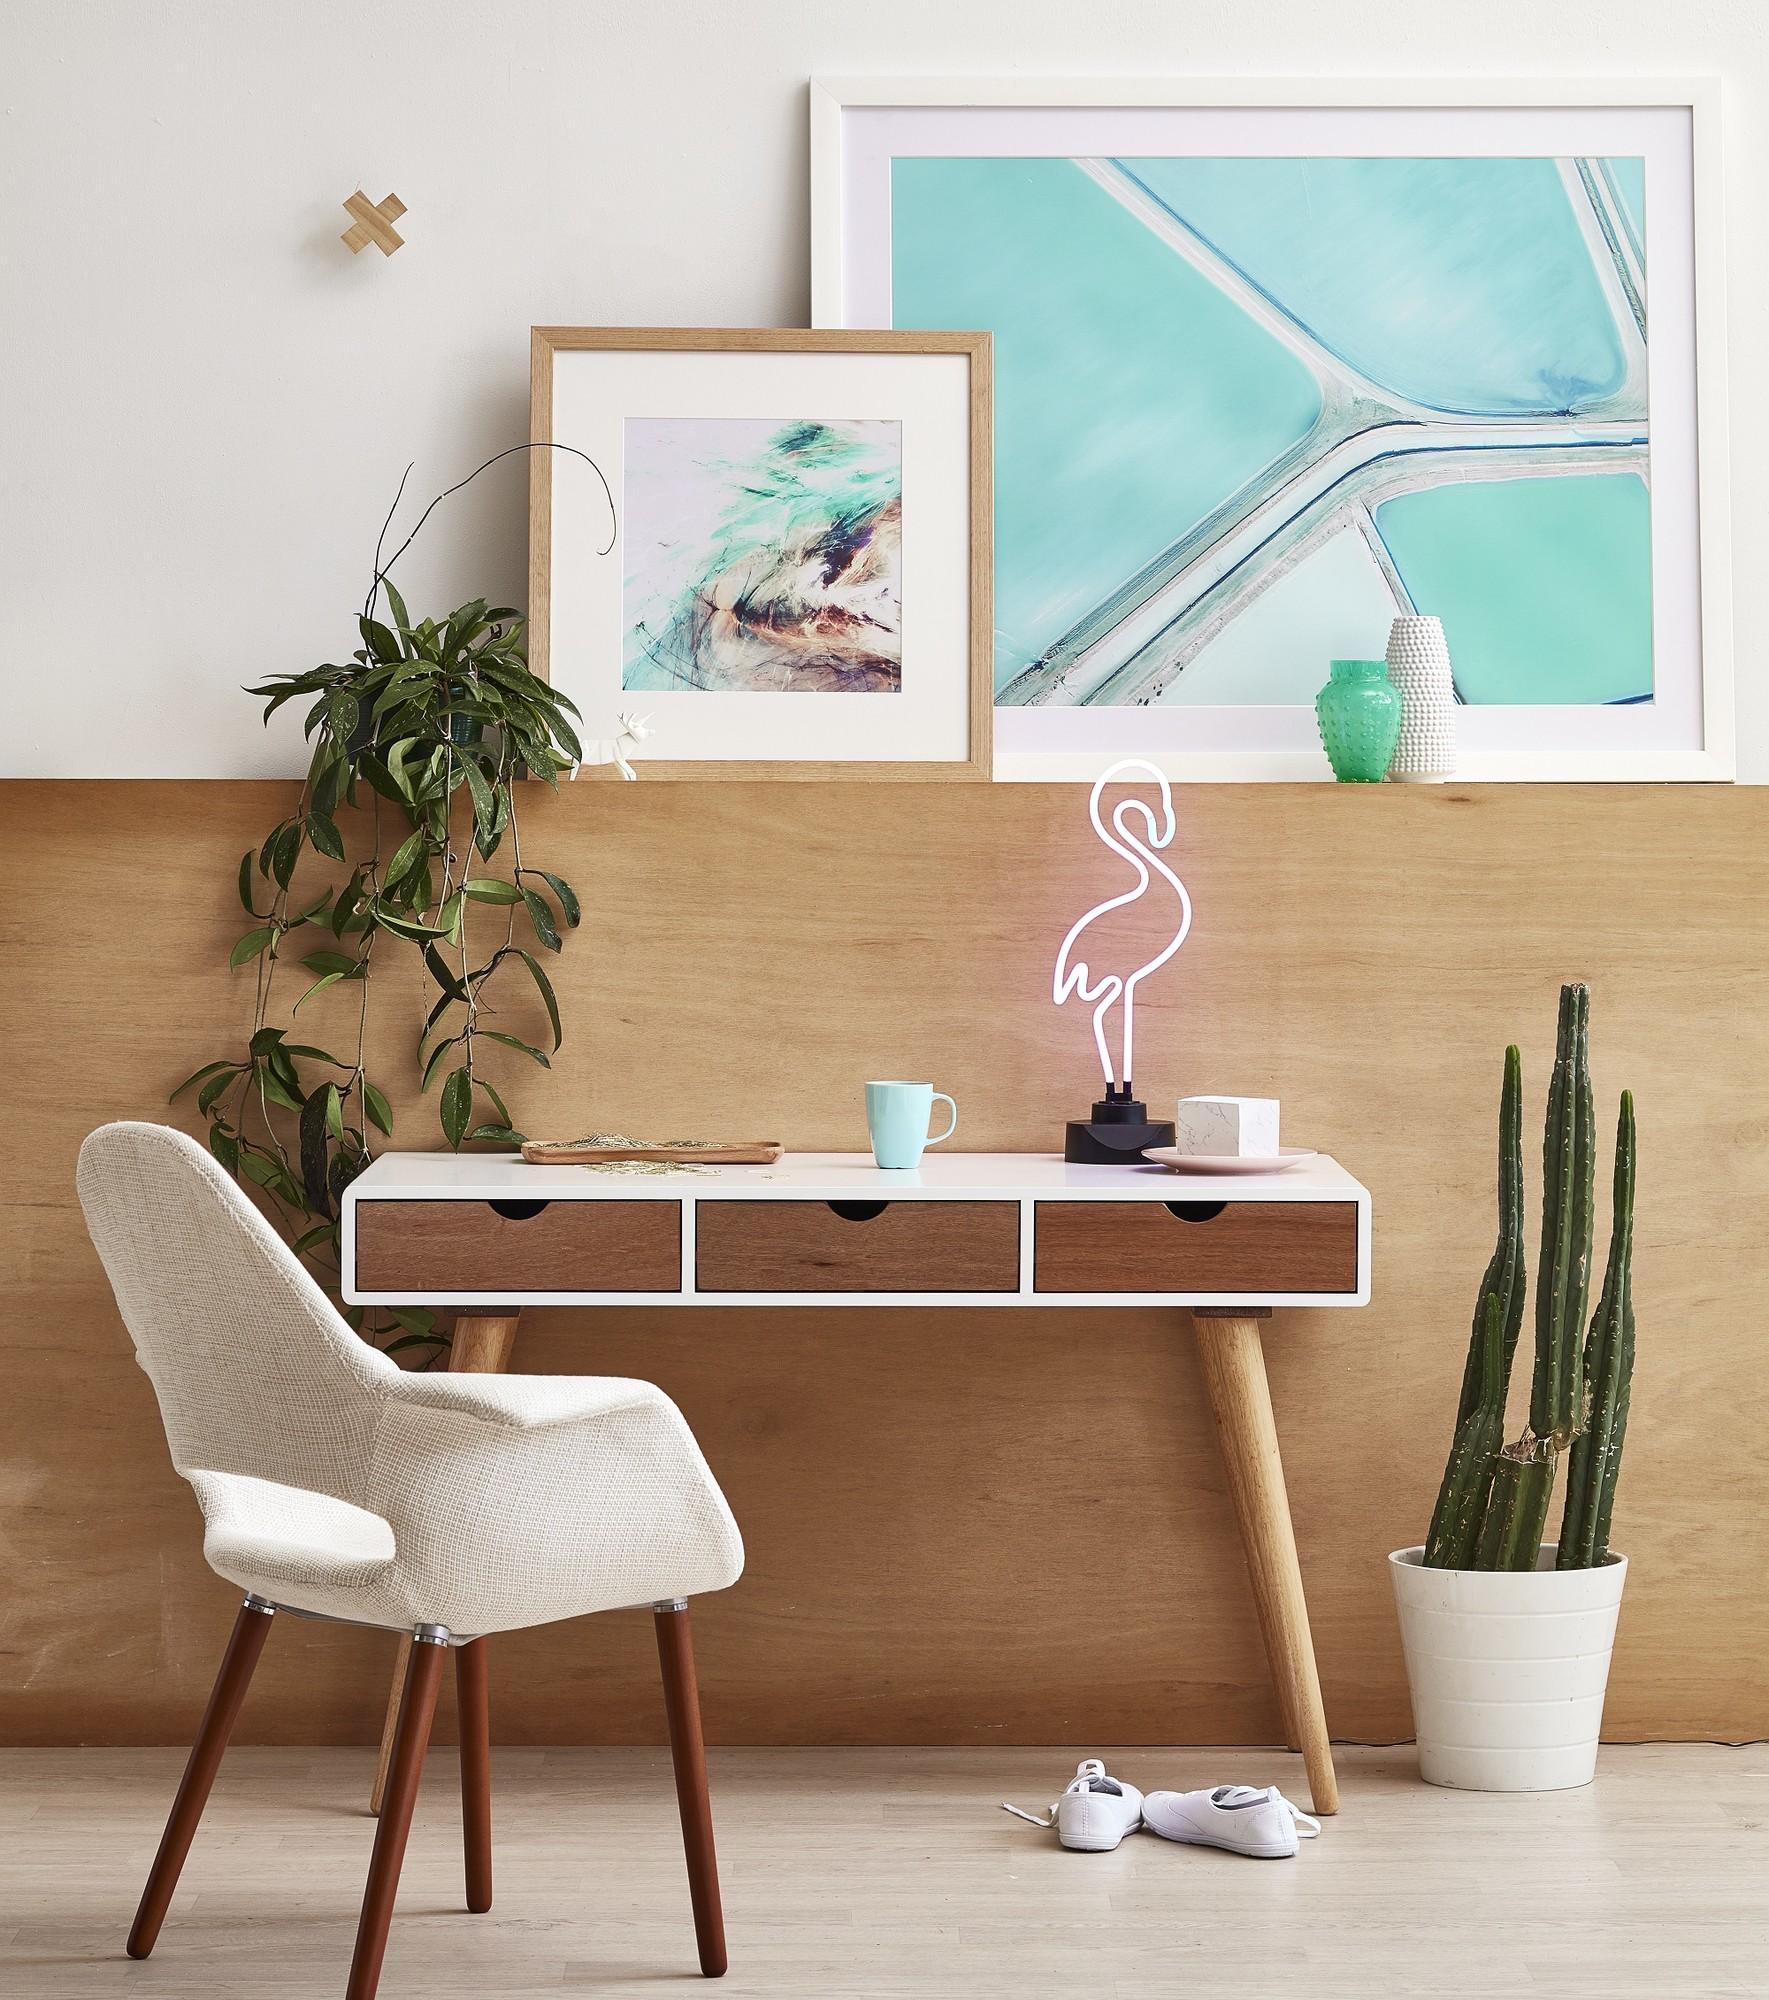 New milan direct johanne scandinavian style office desk ebay for Scandinavian home store